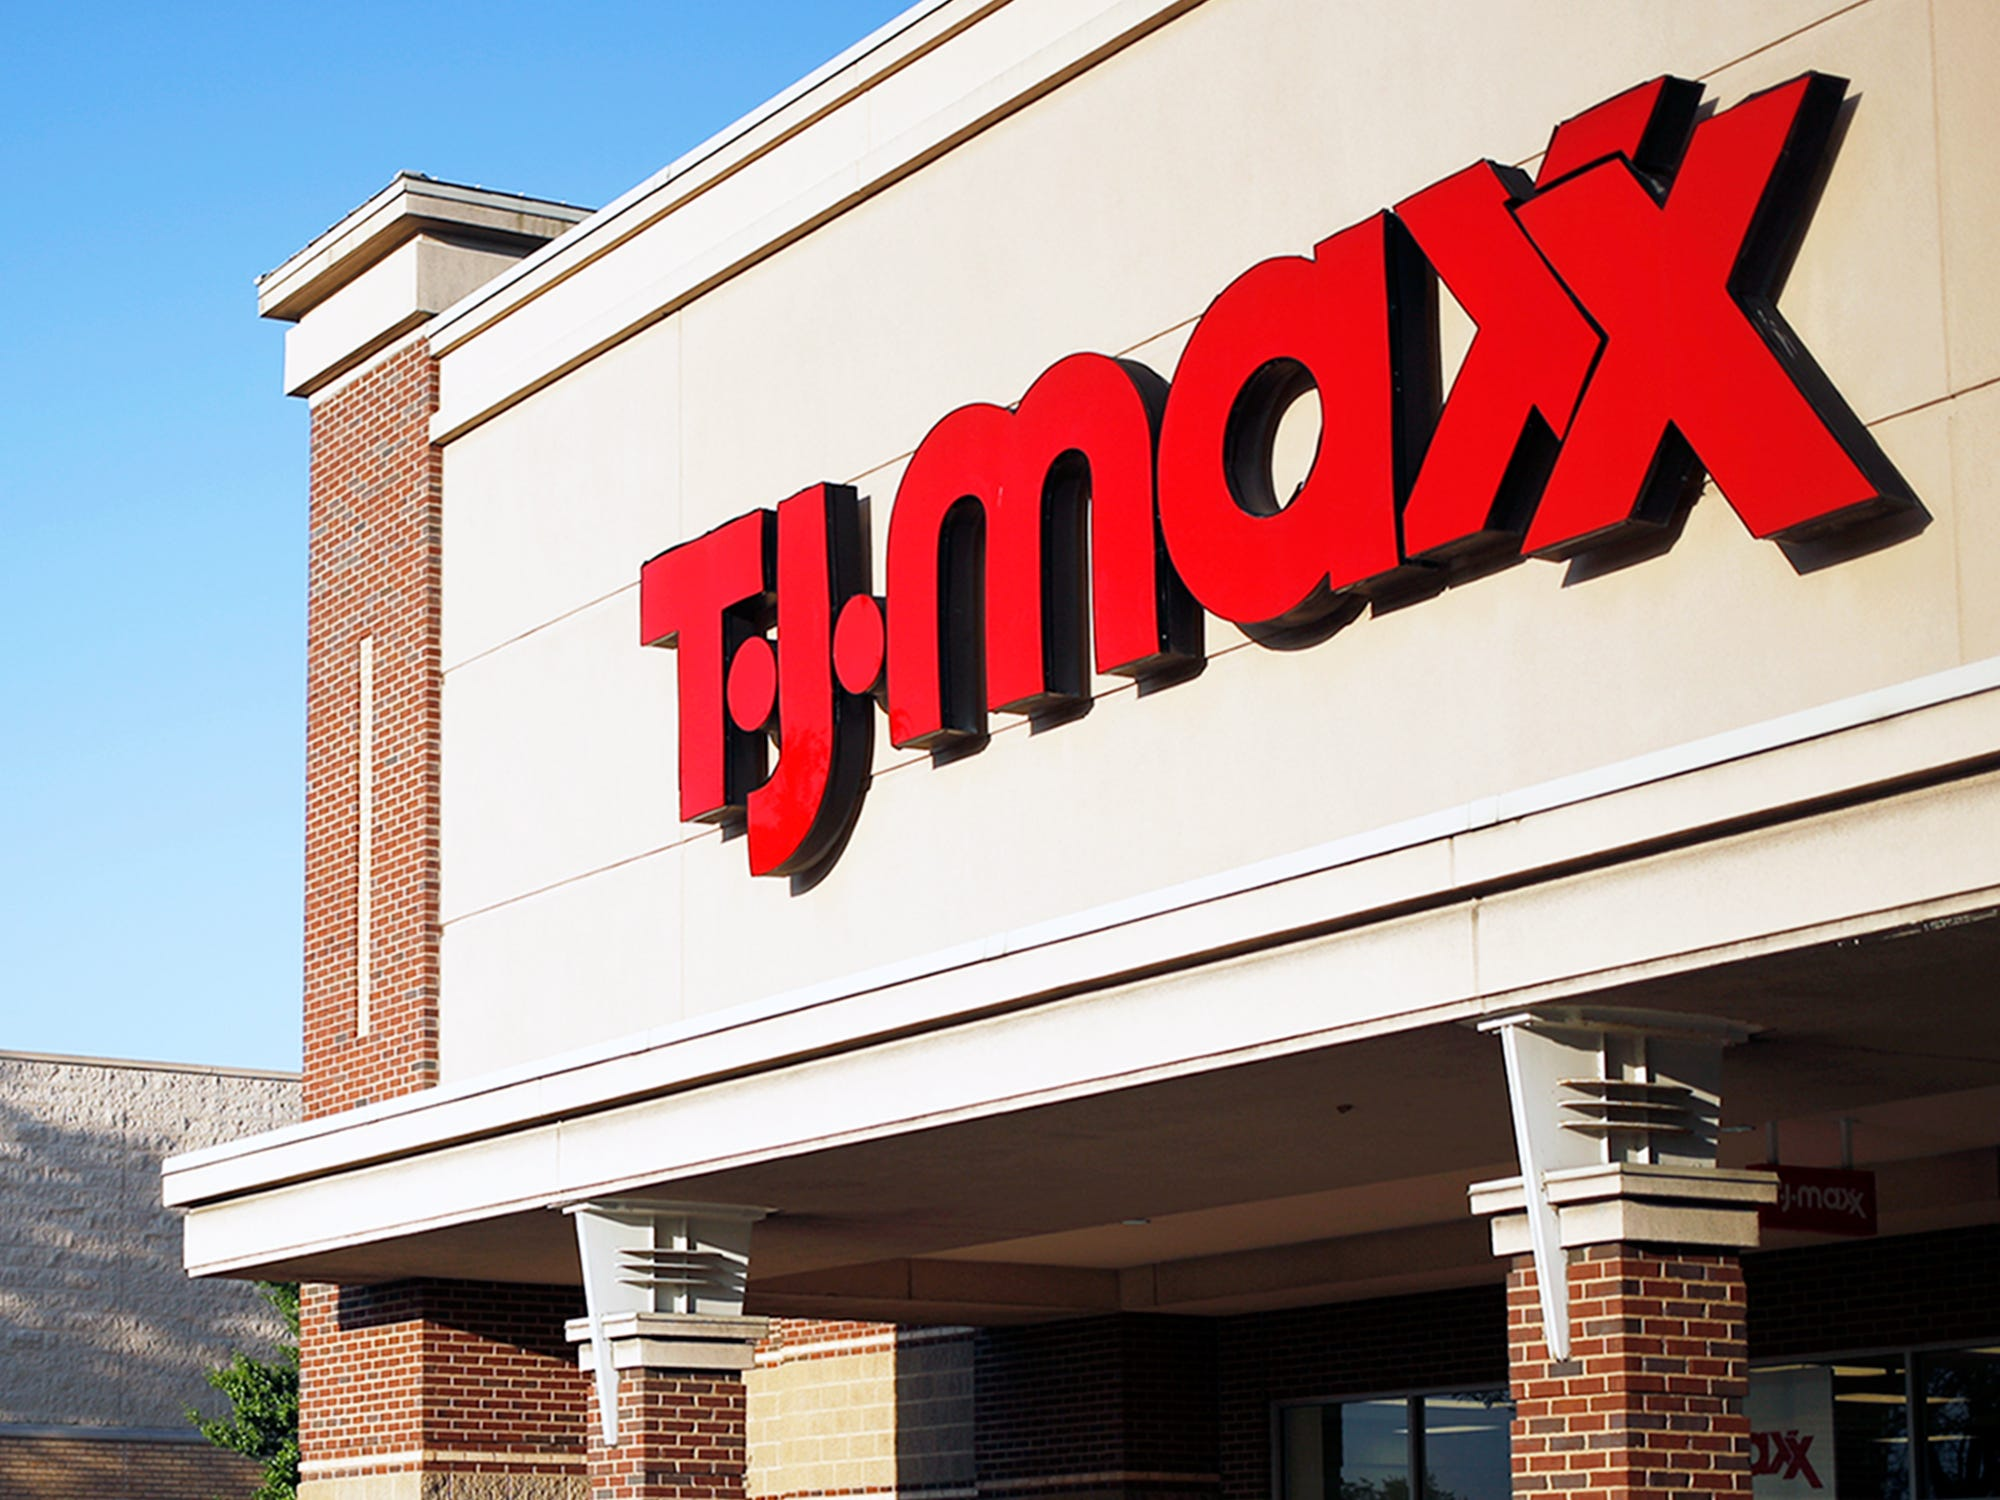 TJ Maxx Home Goods Puerto Rico Employees Paychecks